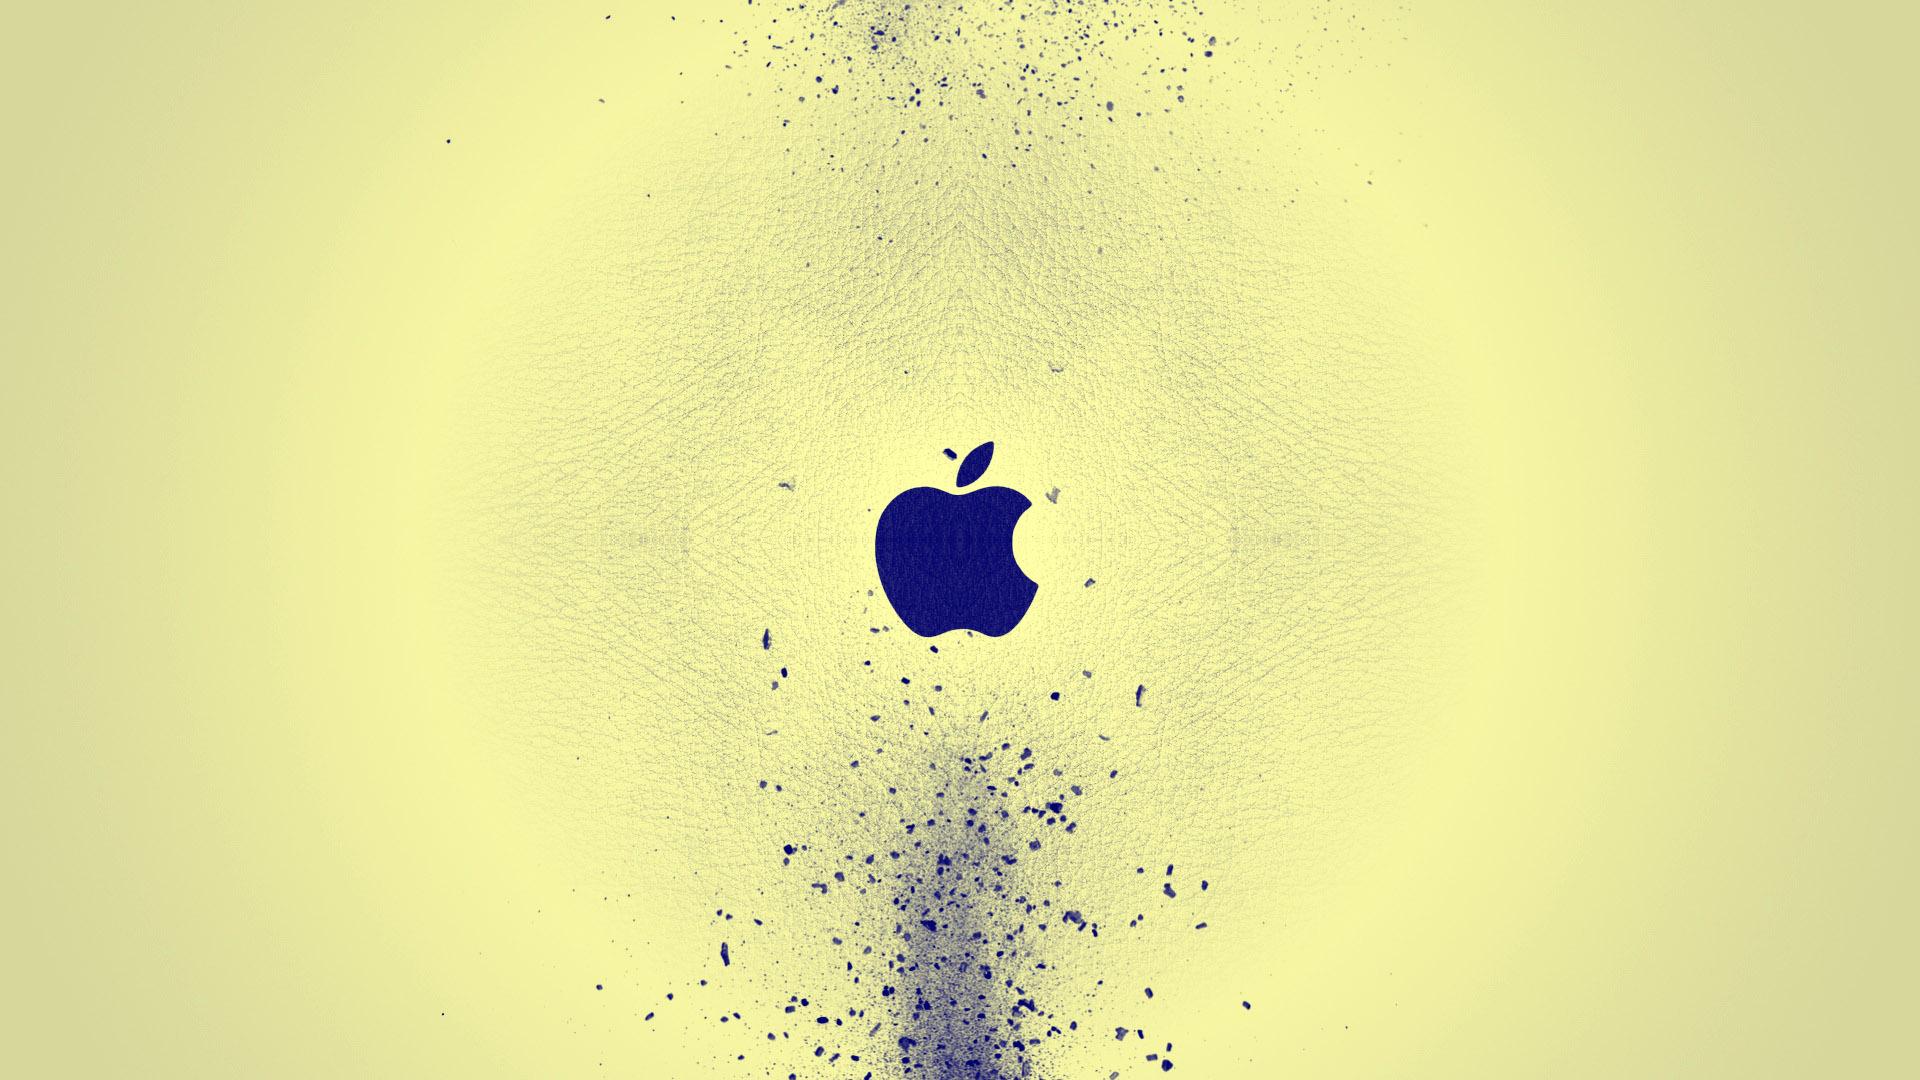 Best Wallpapers for MacBook Pro - WallpaperSafari